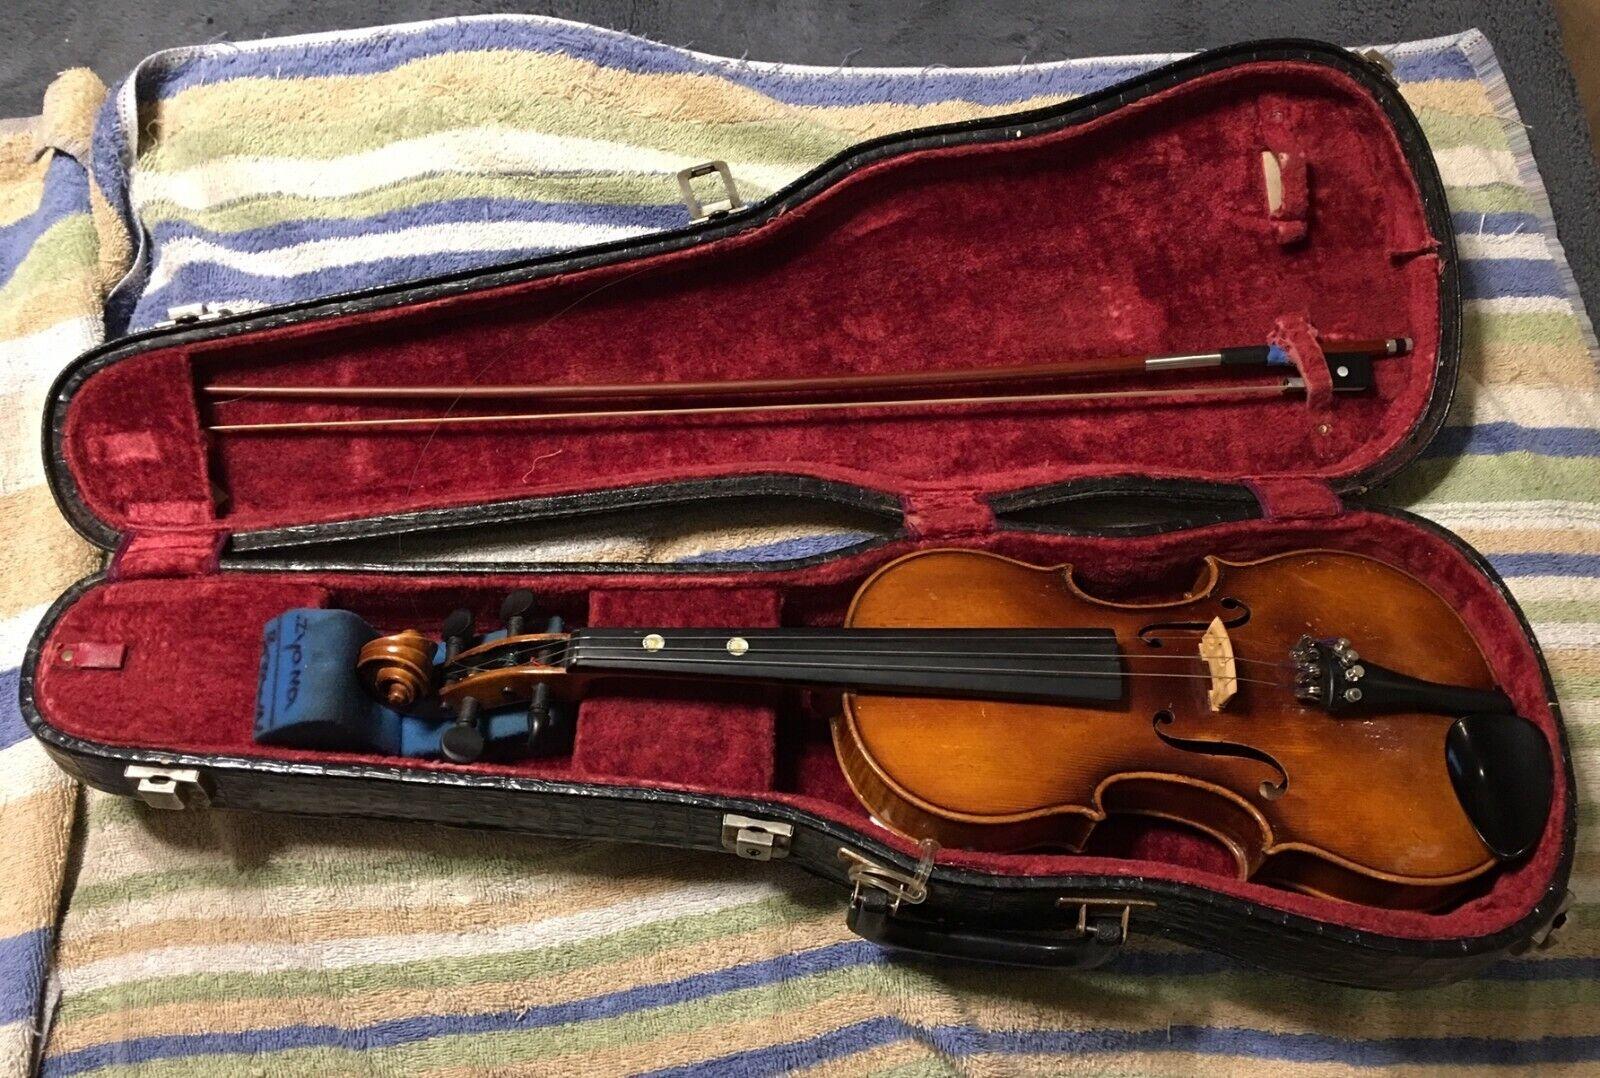 E. R. Pfretzschner 1956. Violin repro of Antonius Stradivarius West Germany